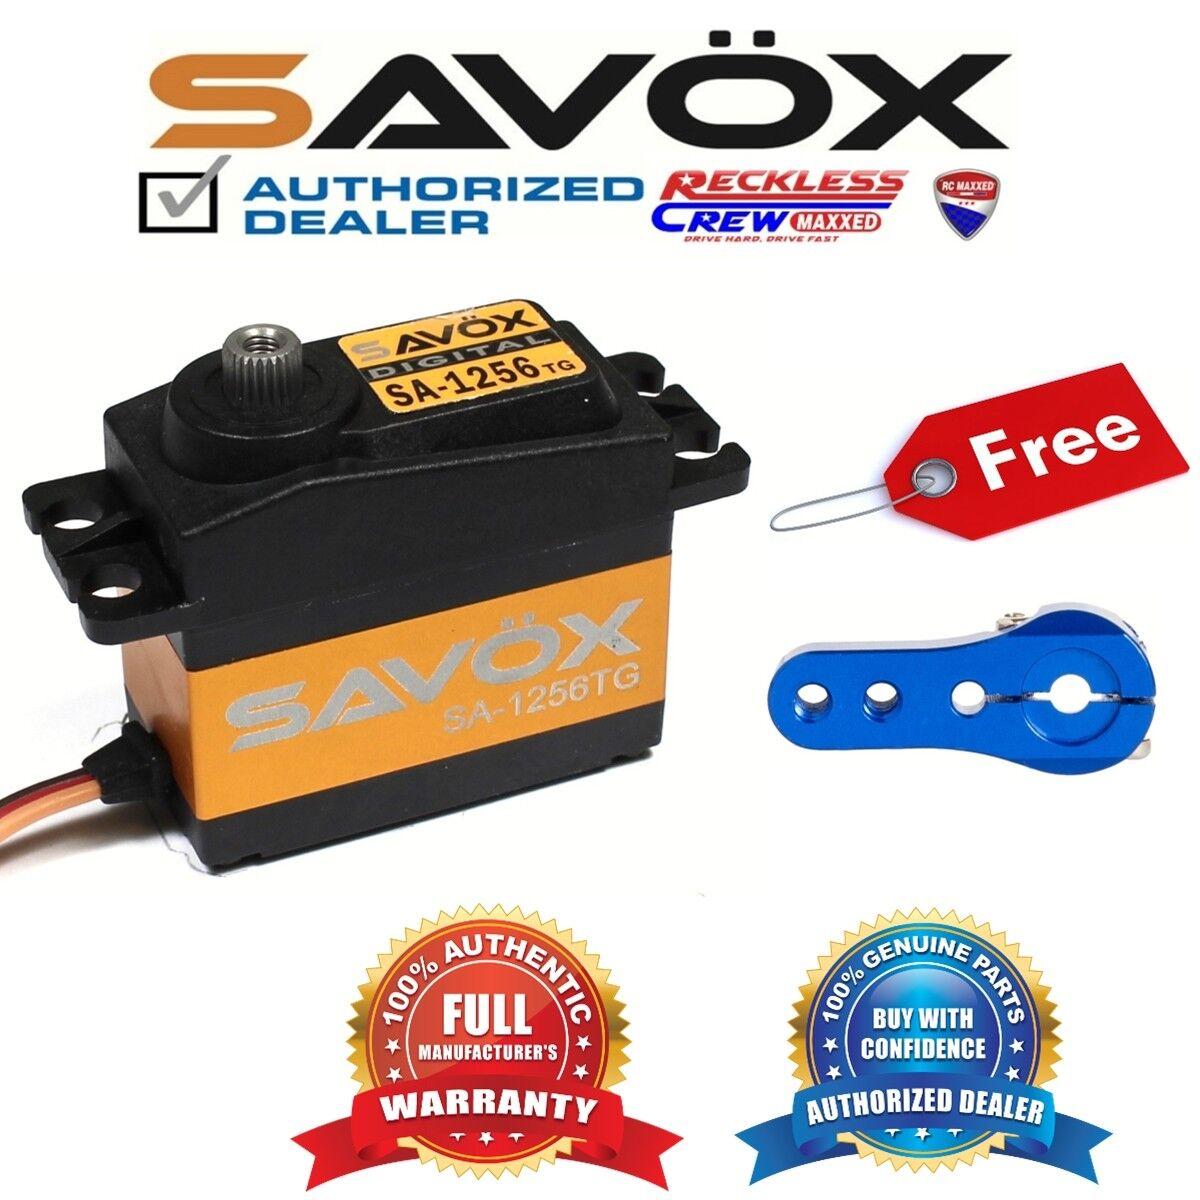 disegni esclusivi Savox SA-1256TG SA-1256TG SA-1256TG Coreless Digital Servo + gratuito Aluminium servo horn blu  compra meglio